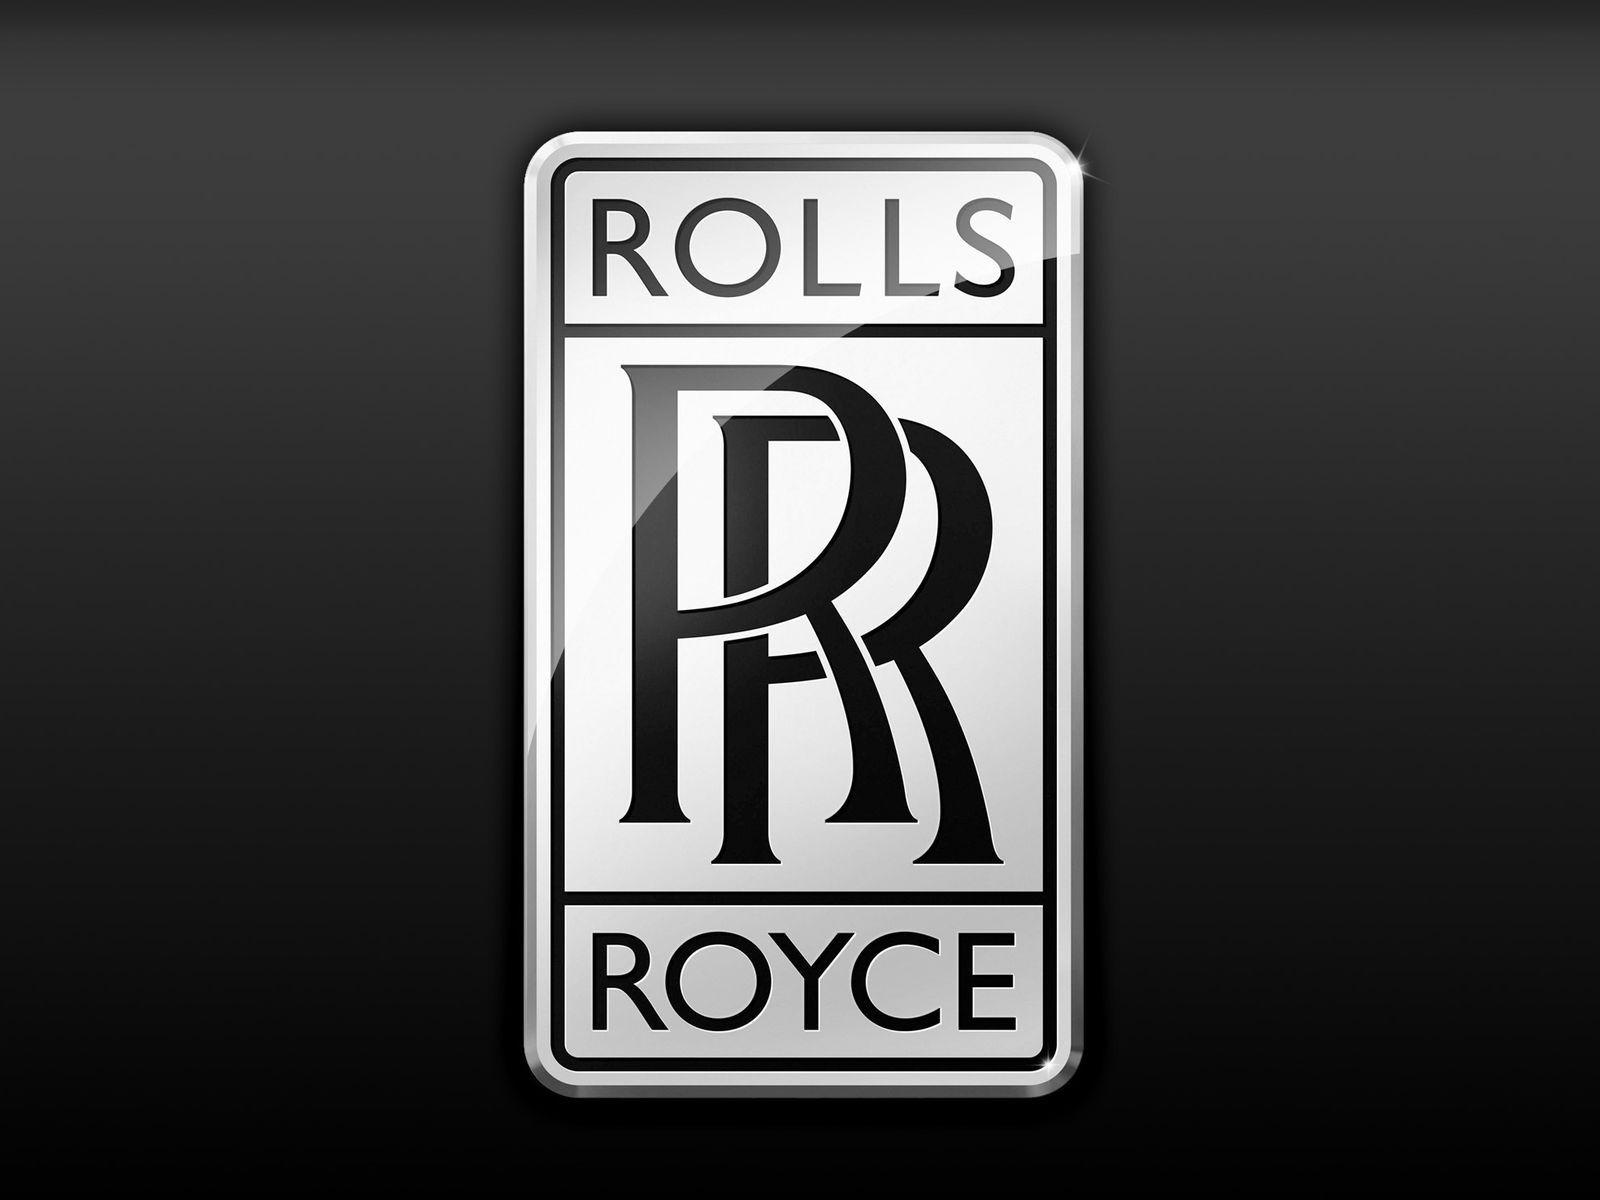 rac royal automobile club 89 pall mall london chairman tom purves expert witness files hrh. Black Bedroom Furniture Sets. Home Design Ideas